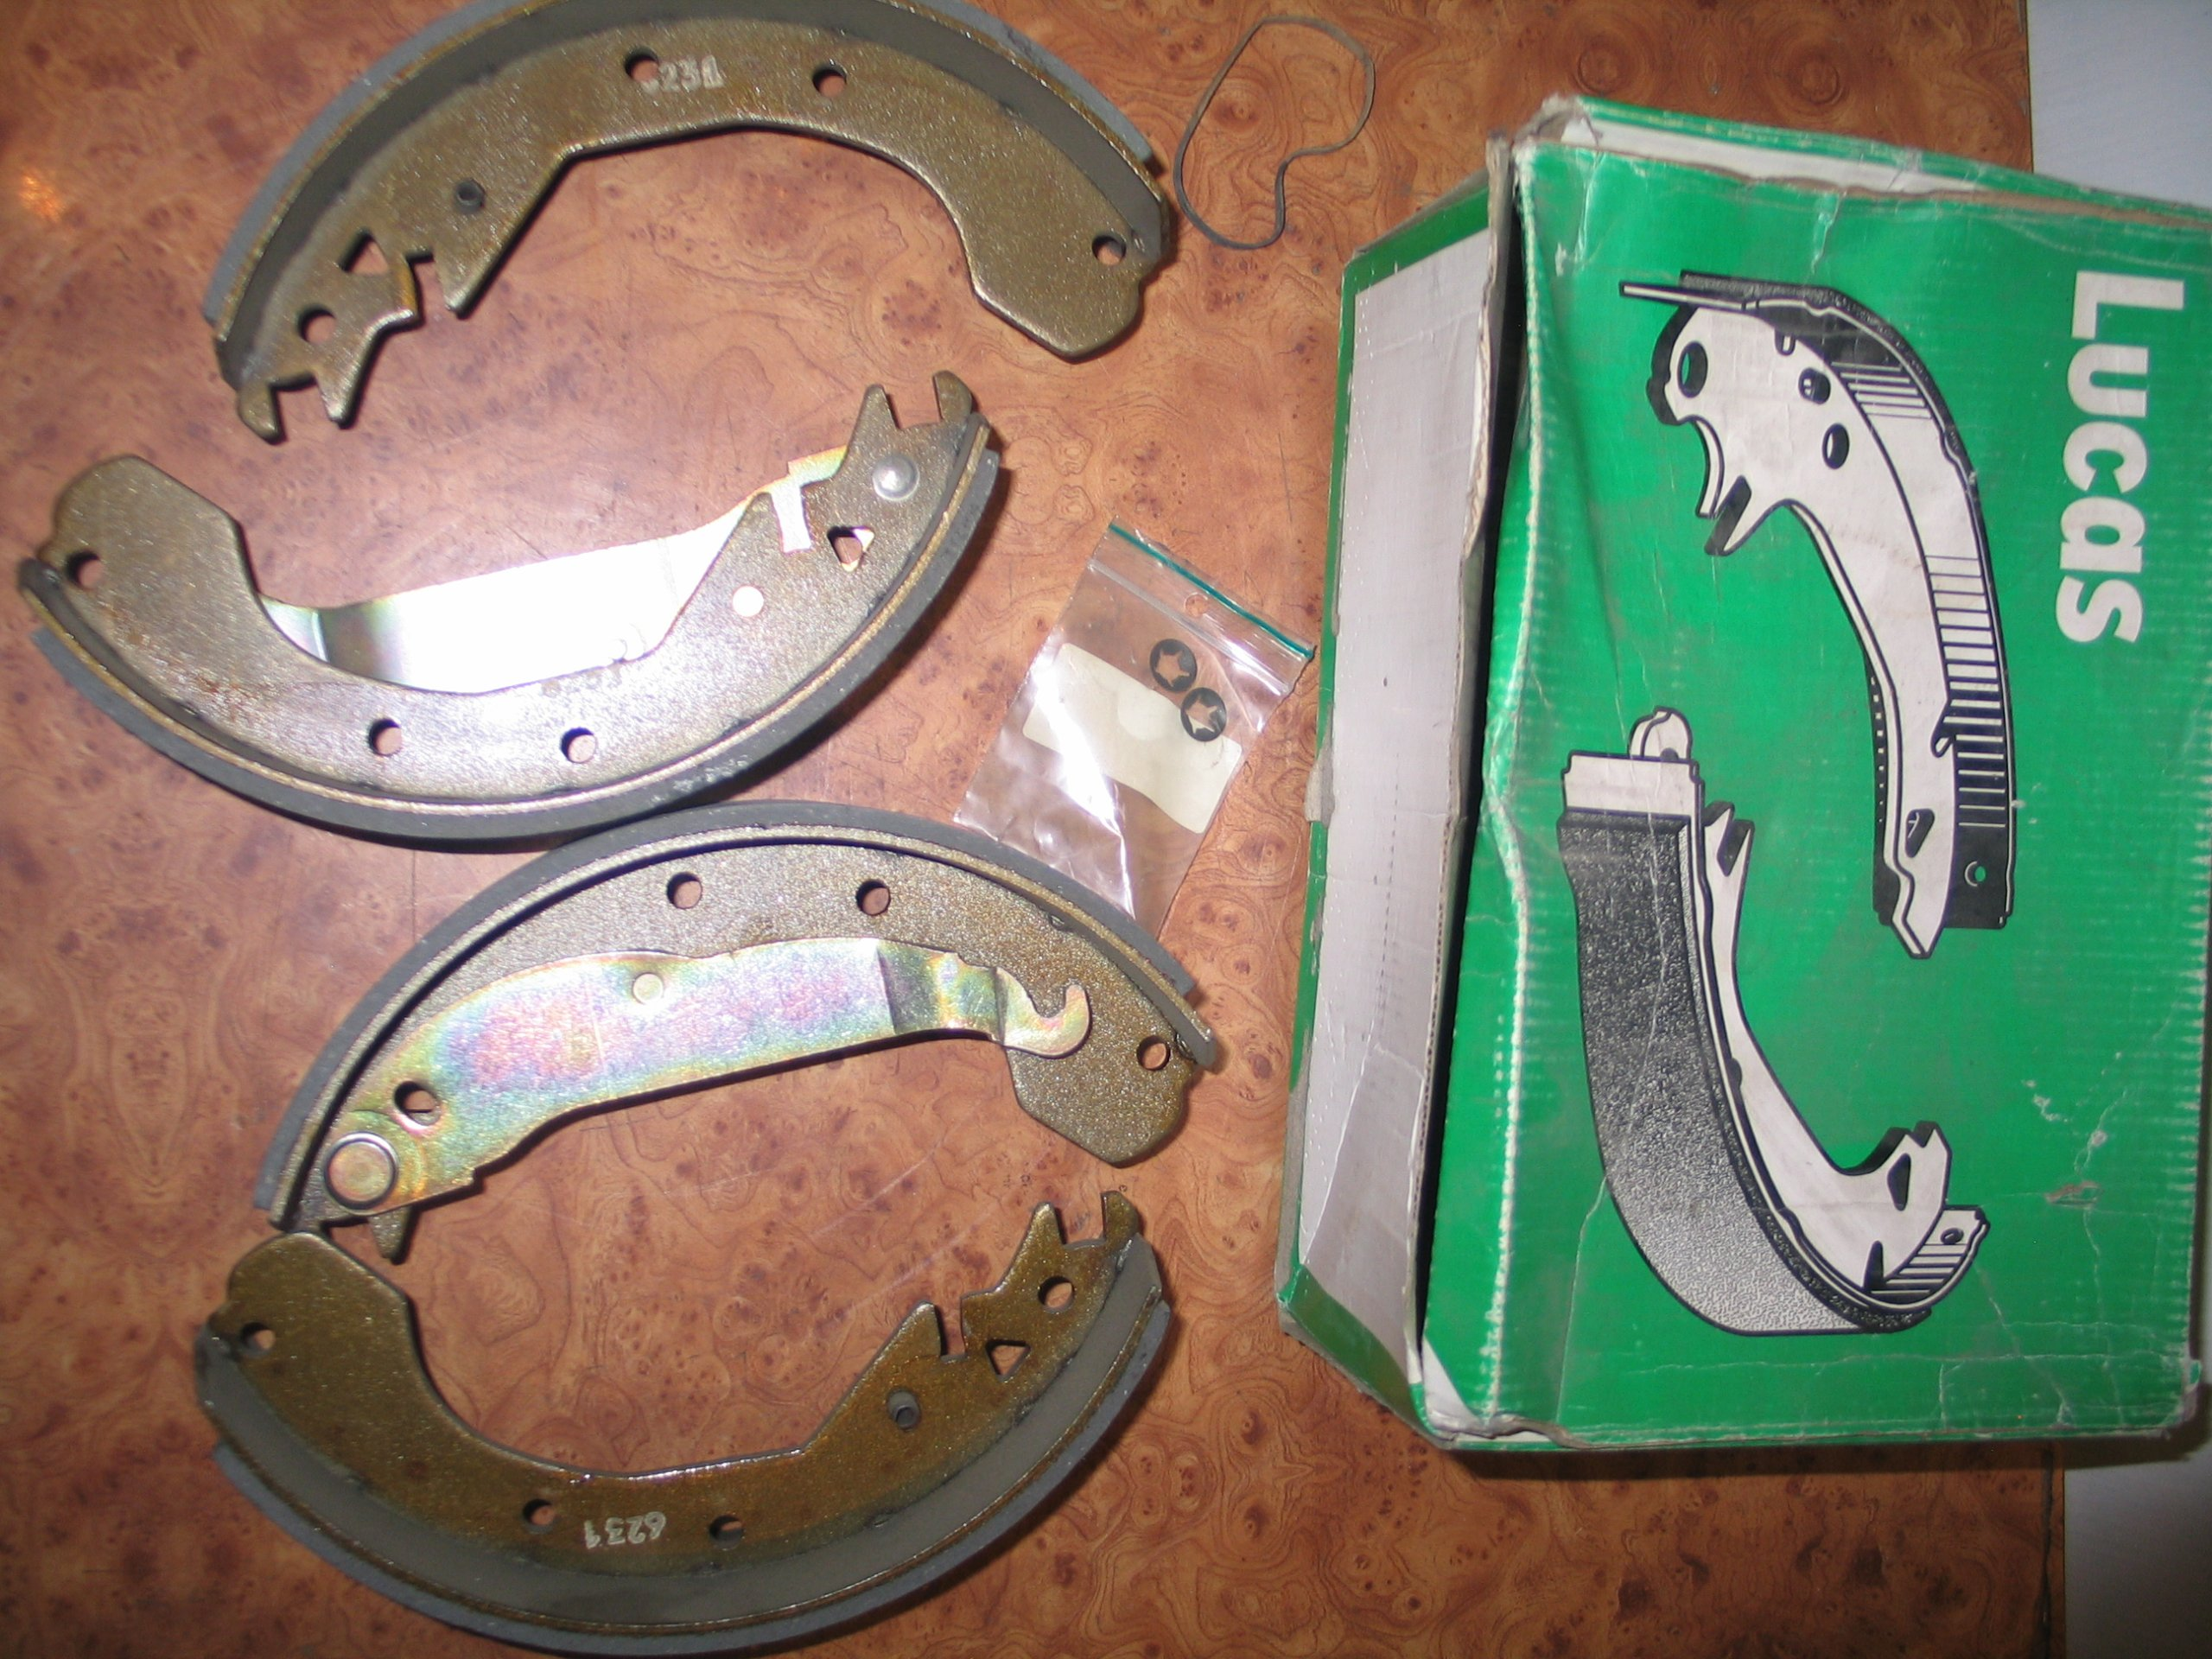 челюсти колодки opel kadett d+e 23051mm универсал